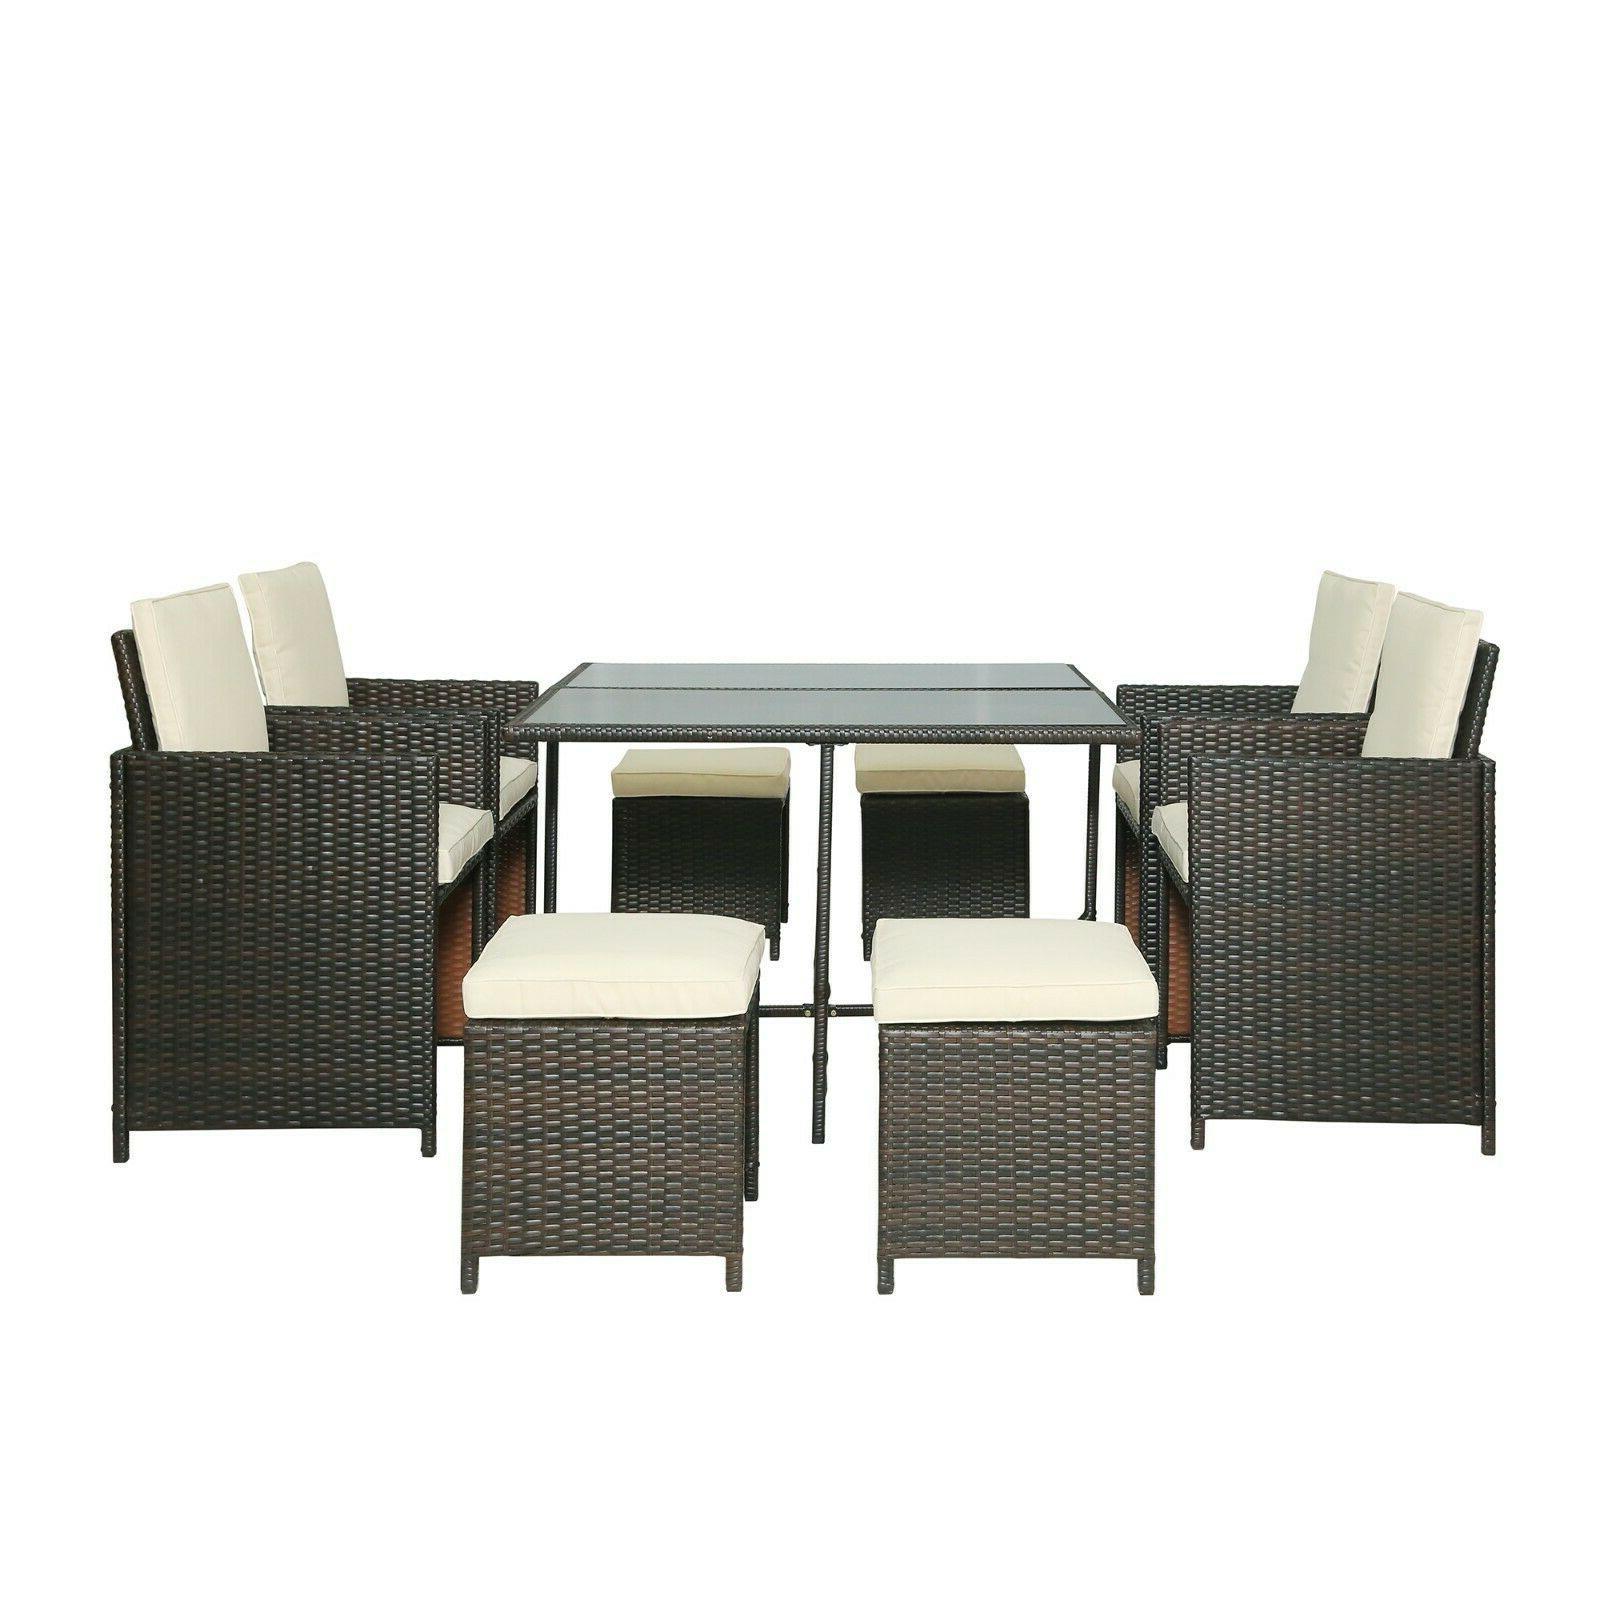 outdoor dining table set rattan patio garden